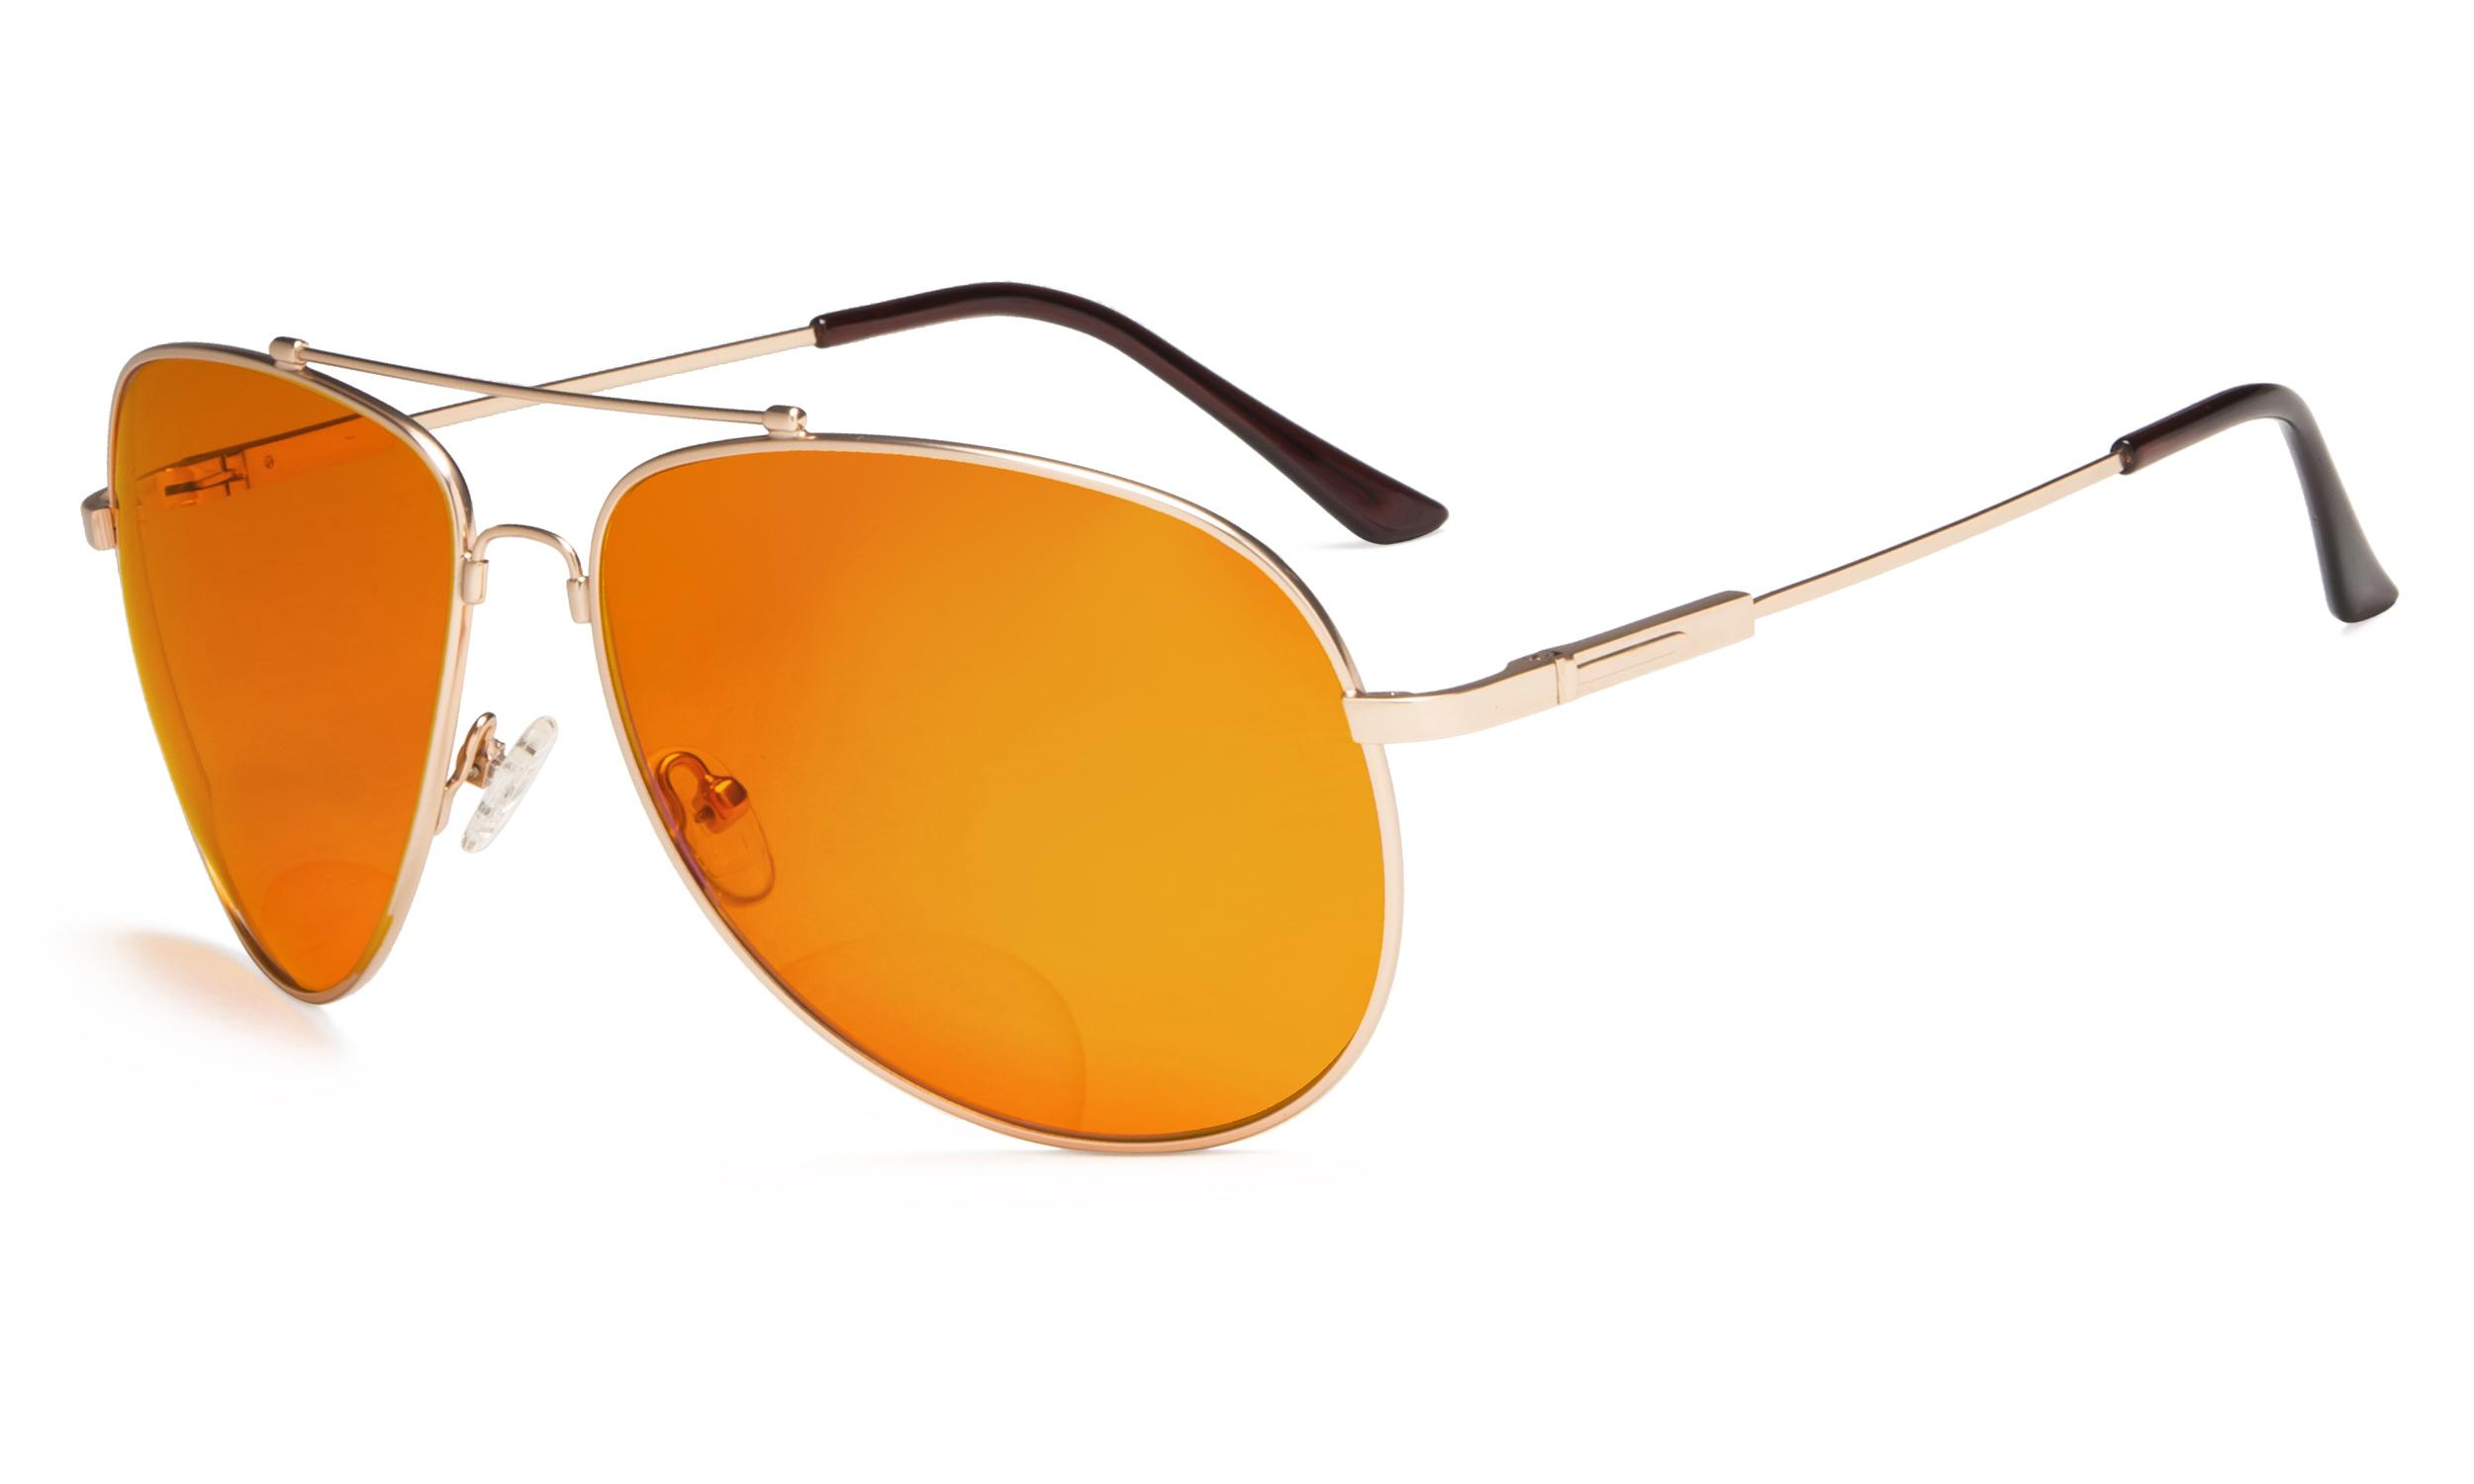 dd6ca063a461 Eyekepper Bifocal Reading Glasses Blue Blocking for Sleep-Nighttime Orange  Tinted Men Women Gold DSSG1802